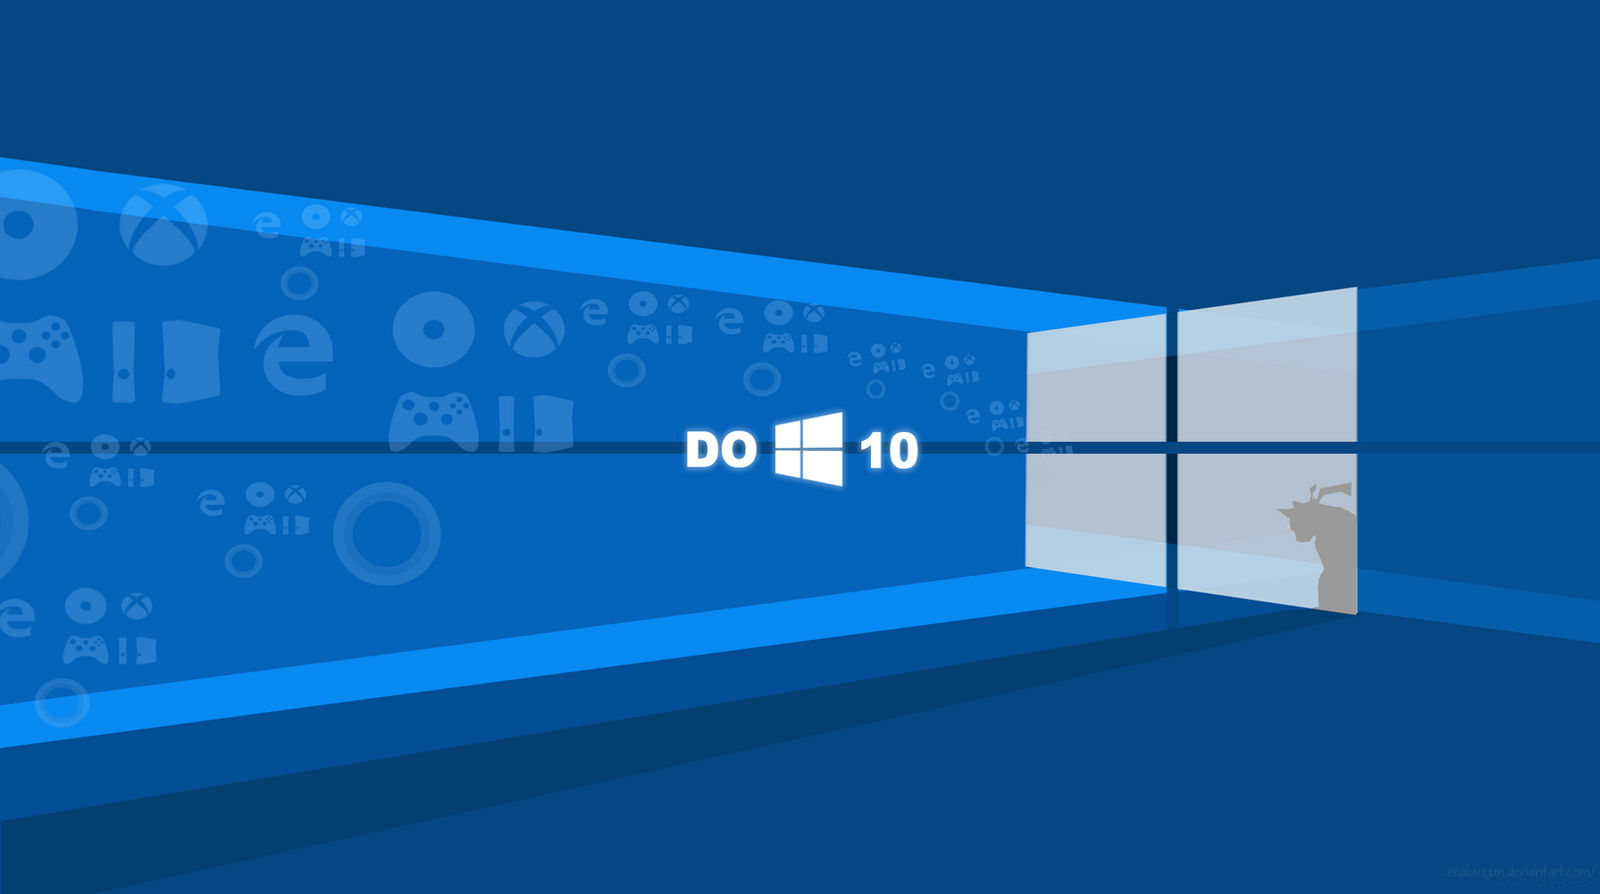 Flat Windows 10 Wallpaper Blue